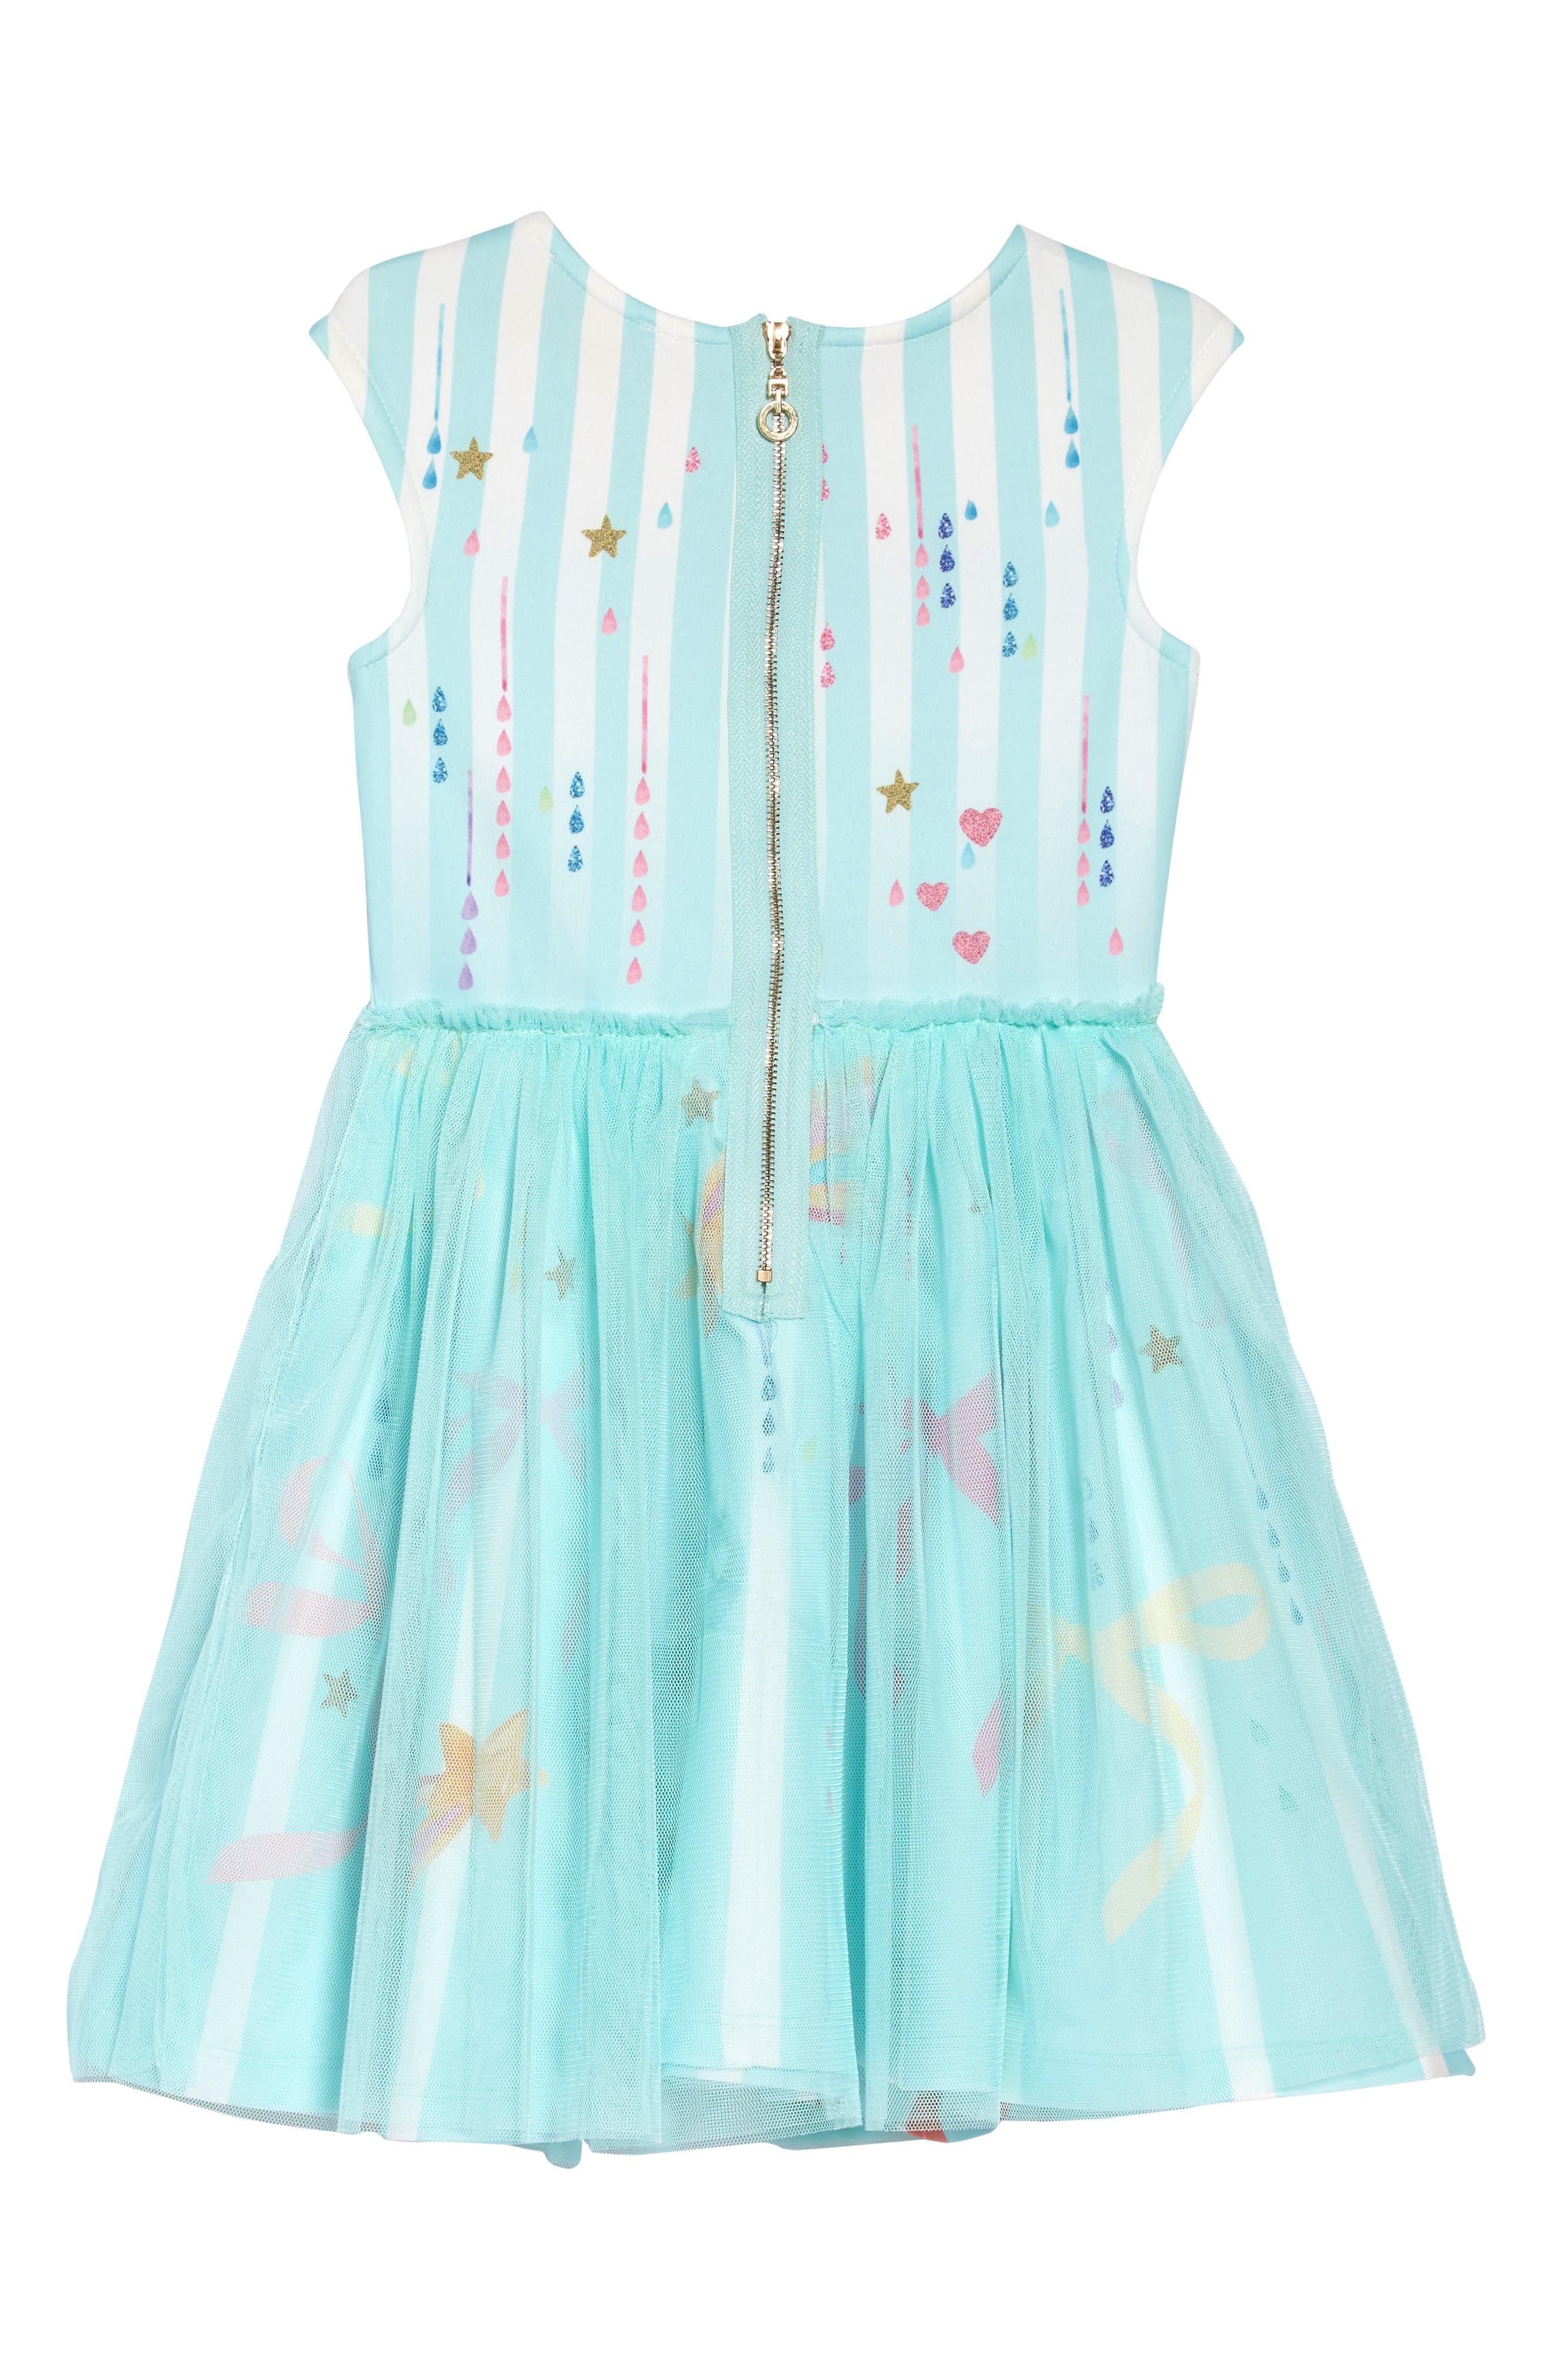 HANNAH BANANA, Bow & Unicorn Fit & Flare Tulle Dress, Alternate thumbnail 2, color, MINT MULTI